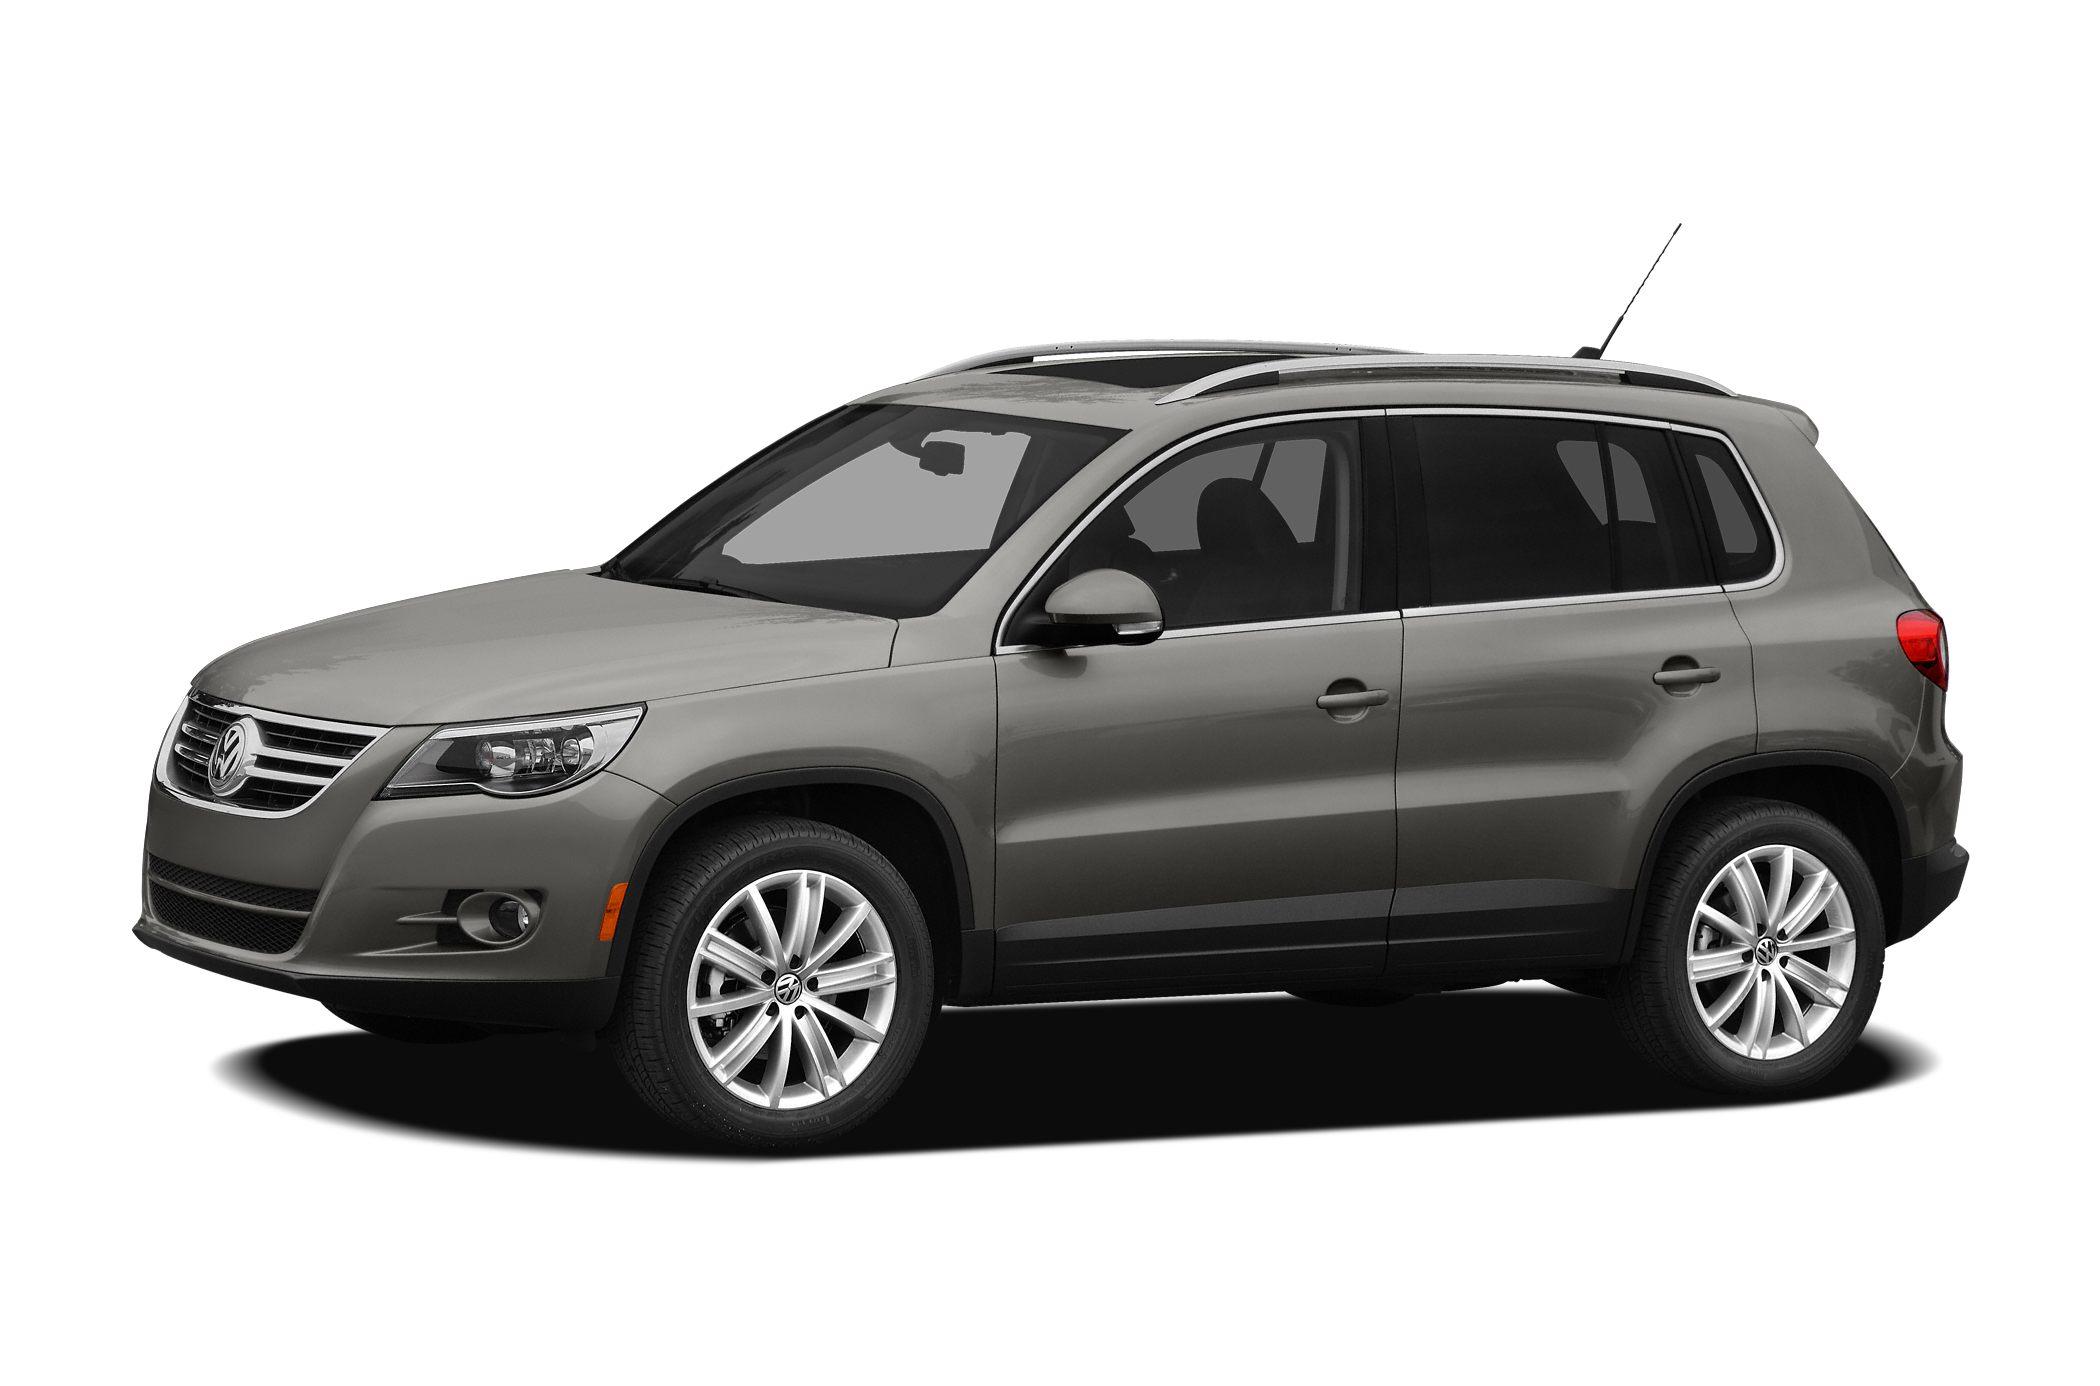 2011 Volkswagen Tiguan S PERFORMED REBALANCE TO WHEELS PREMIUM WHEELS  CLEAN VEHICLE HISTORY